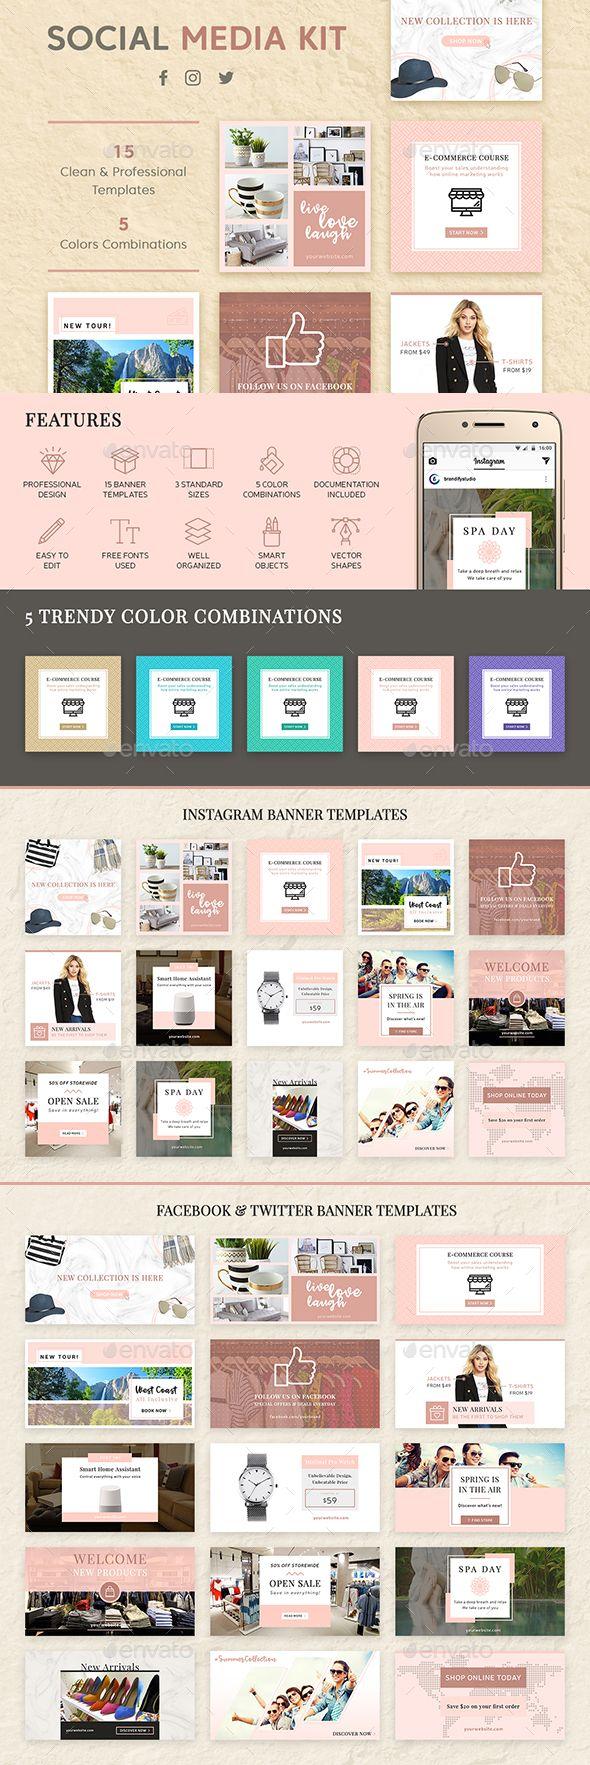 Social Media Kit — Photoshop PSD #twitter banners #kit • Download ➝ https://graphicriver.net/item/social-media-kit/19713200?ref=pxcr